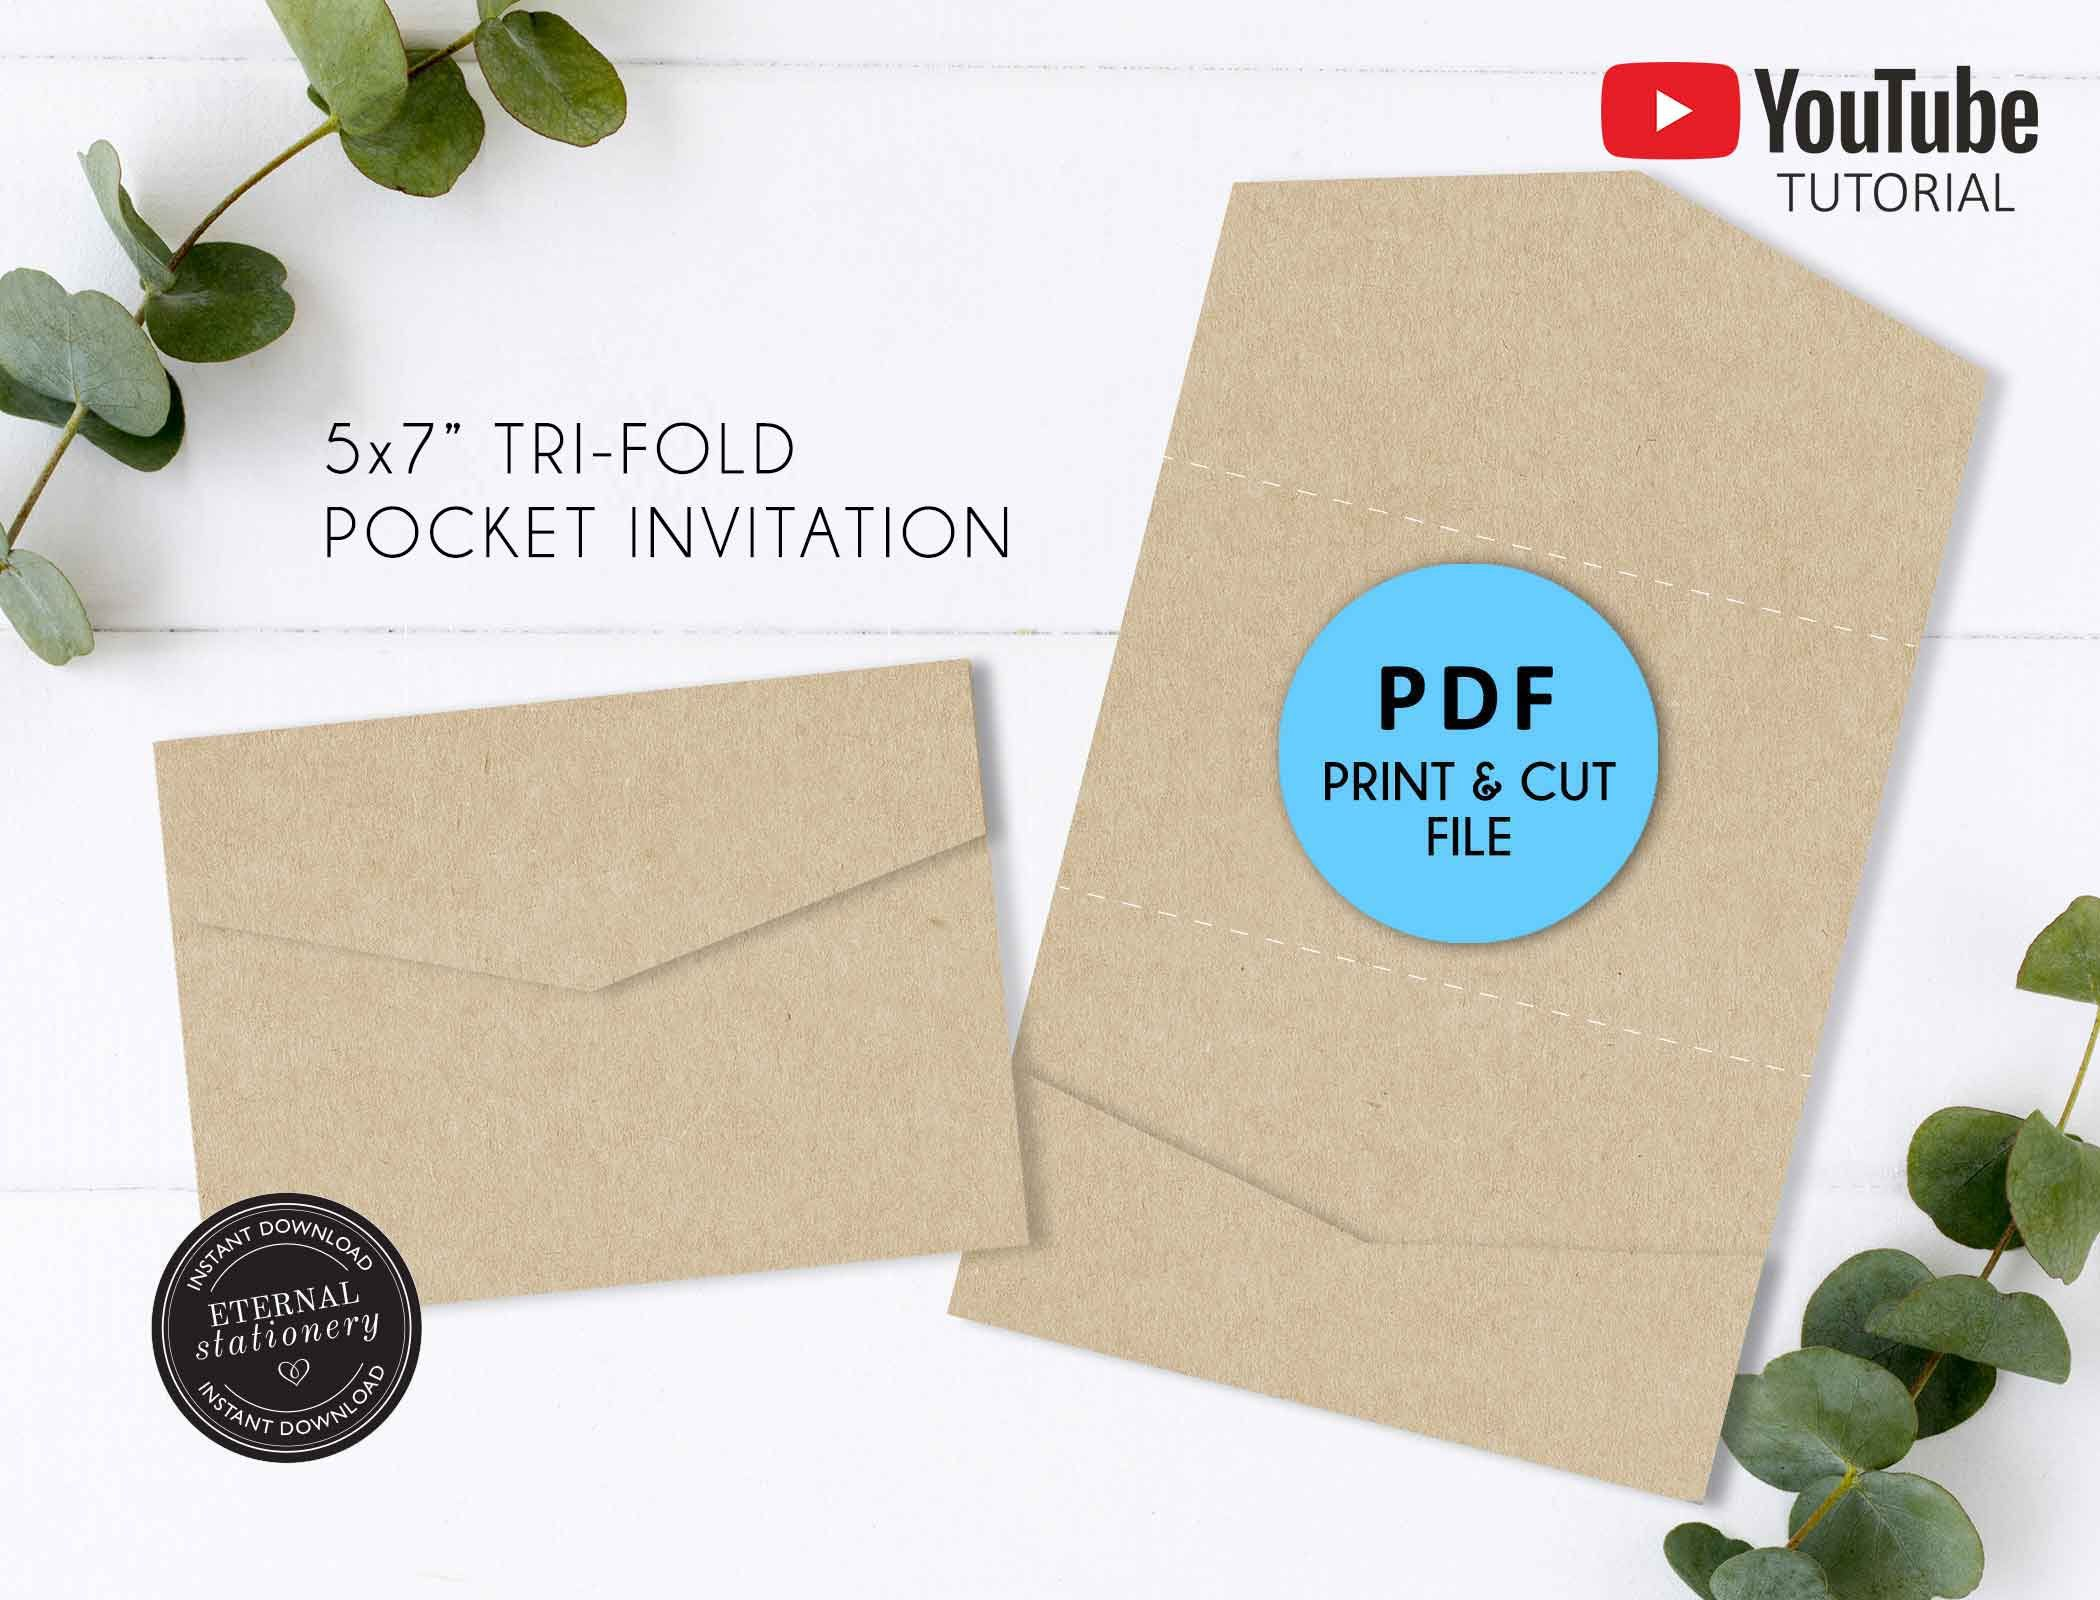 5x7 Pocket Wedding Invitation Template Pdf Pocket Folio Invitation Pocket Invitatio Pocket Wedding Invitations Wedding Invitation Templates Pocket Invitation